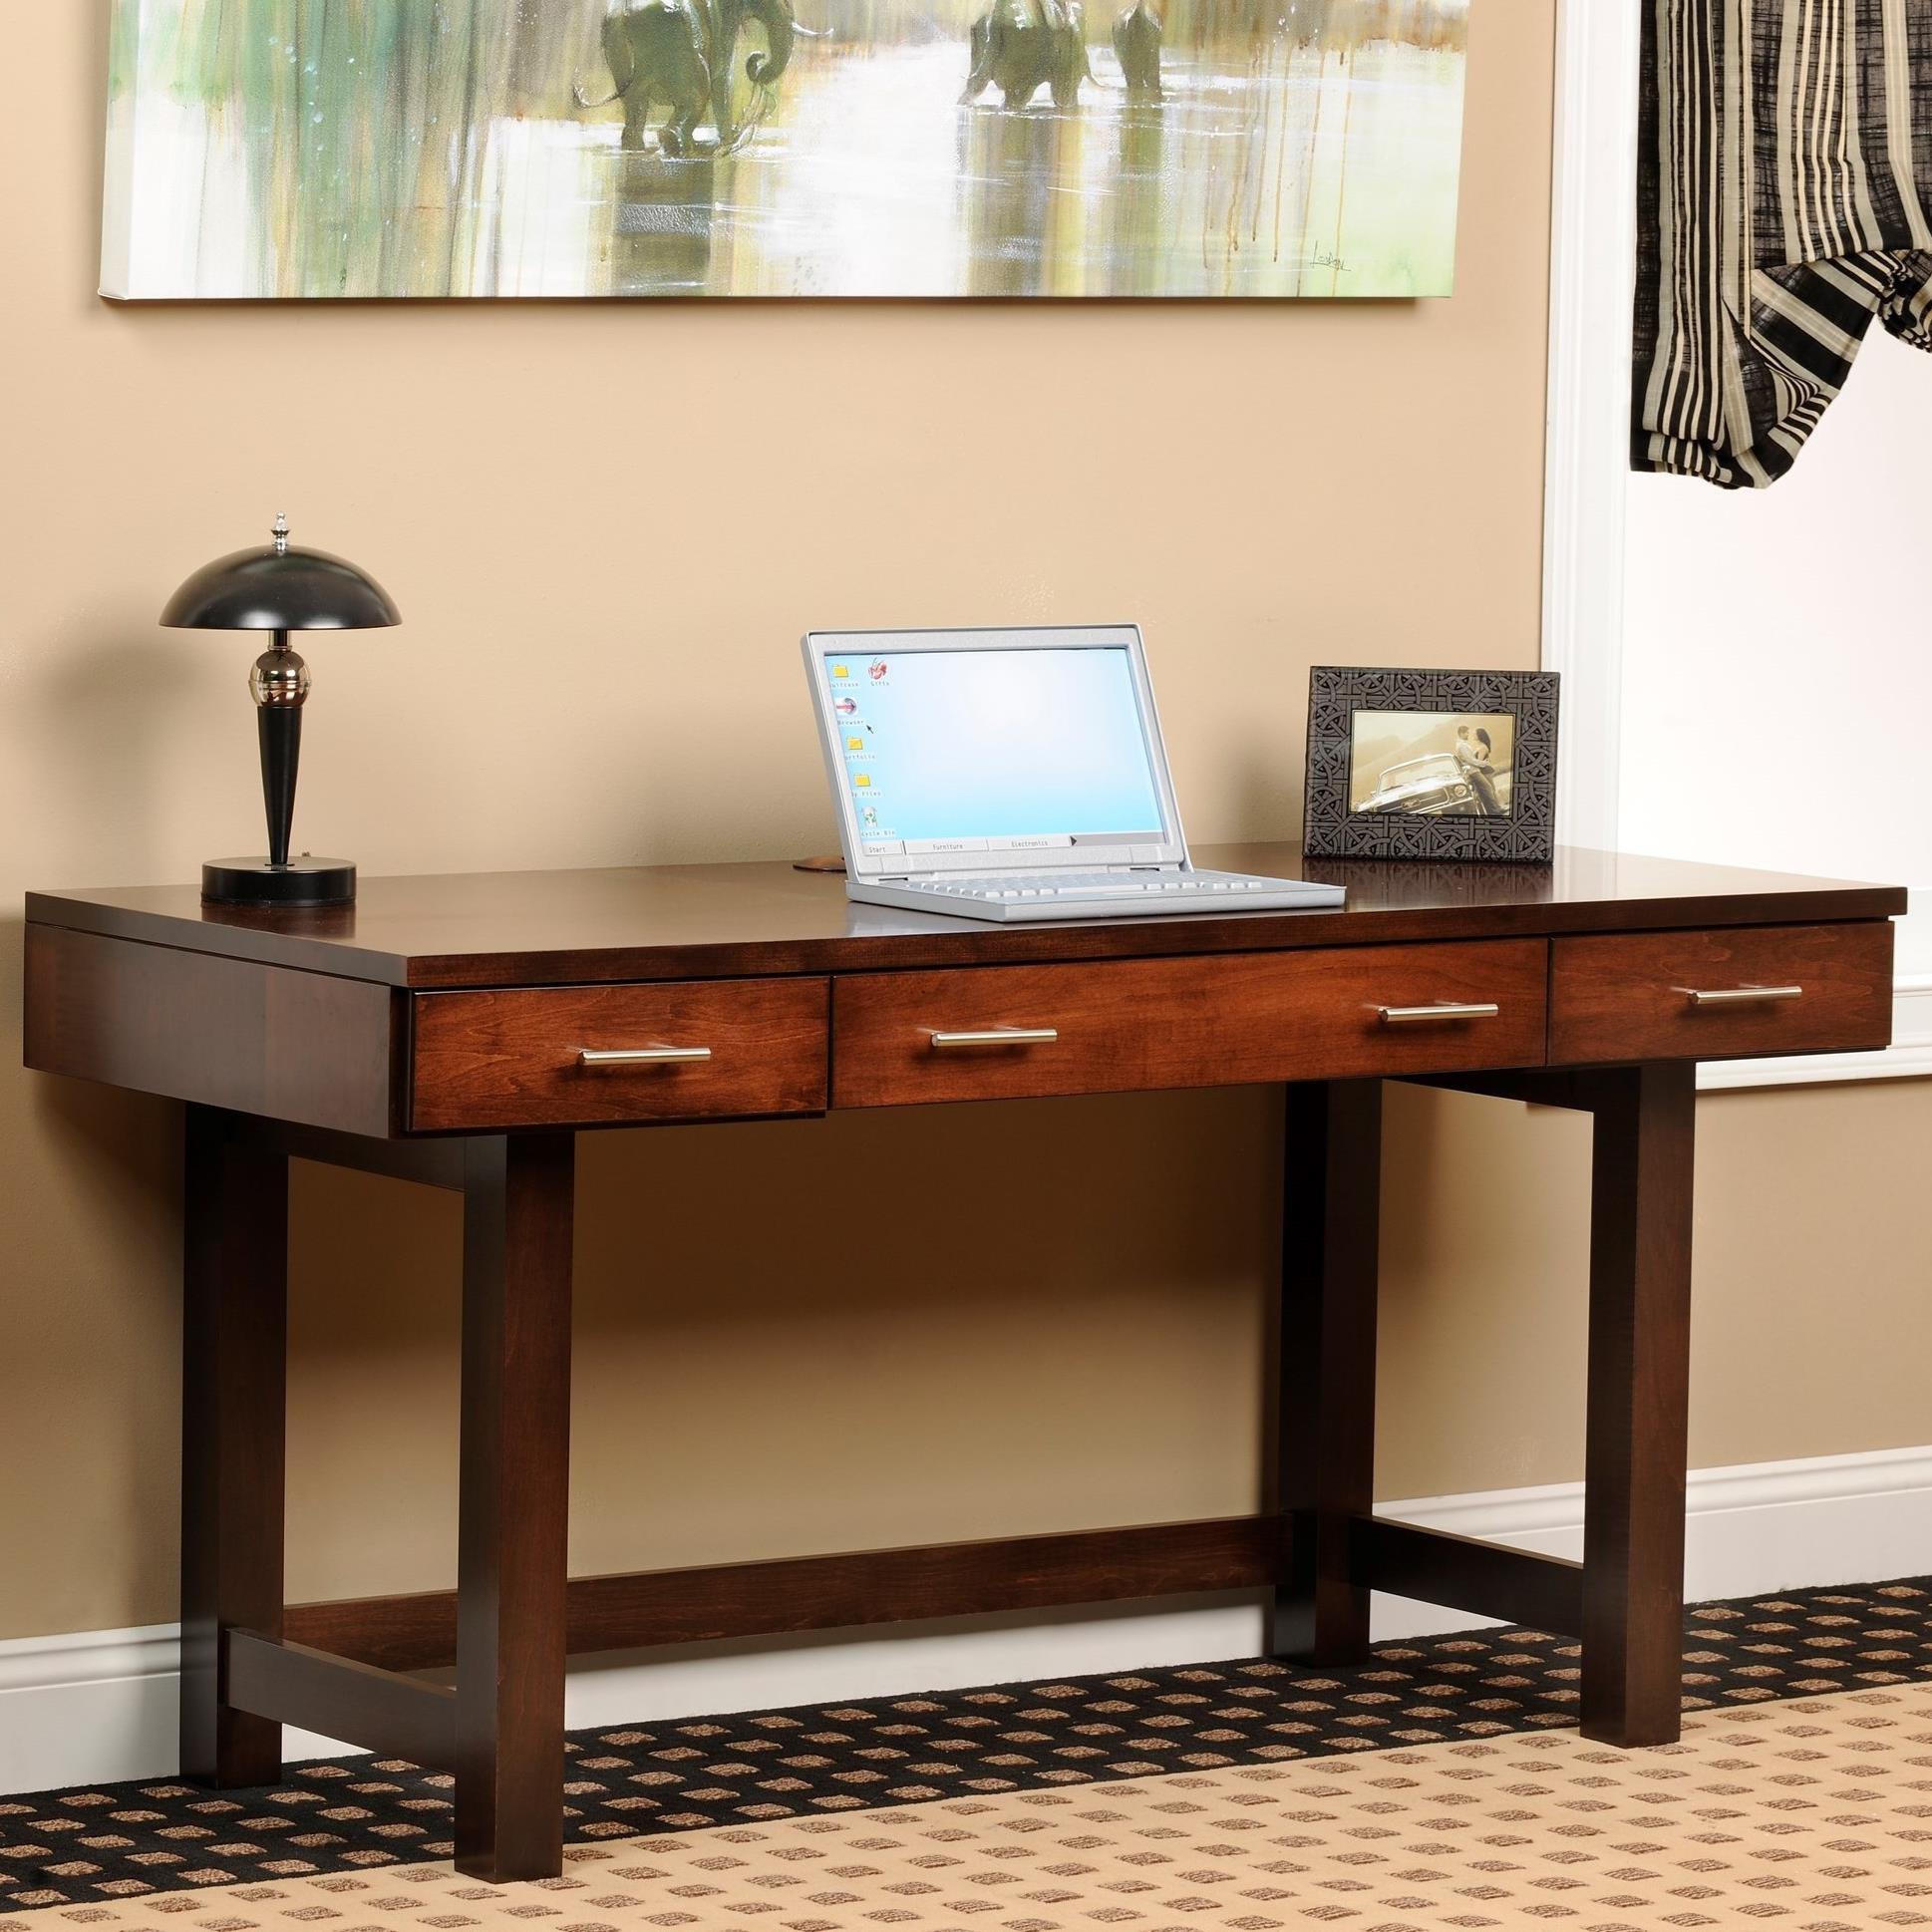 Ordinaire Y U0026 T Woodcraft Urban OfficeTable Desk ...